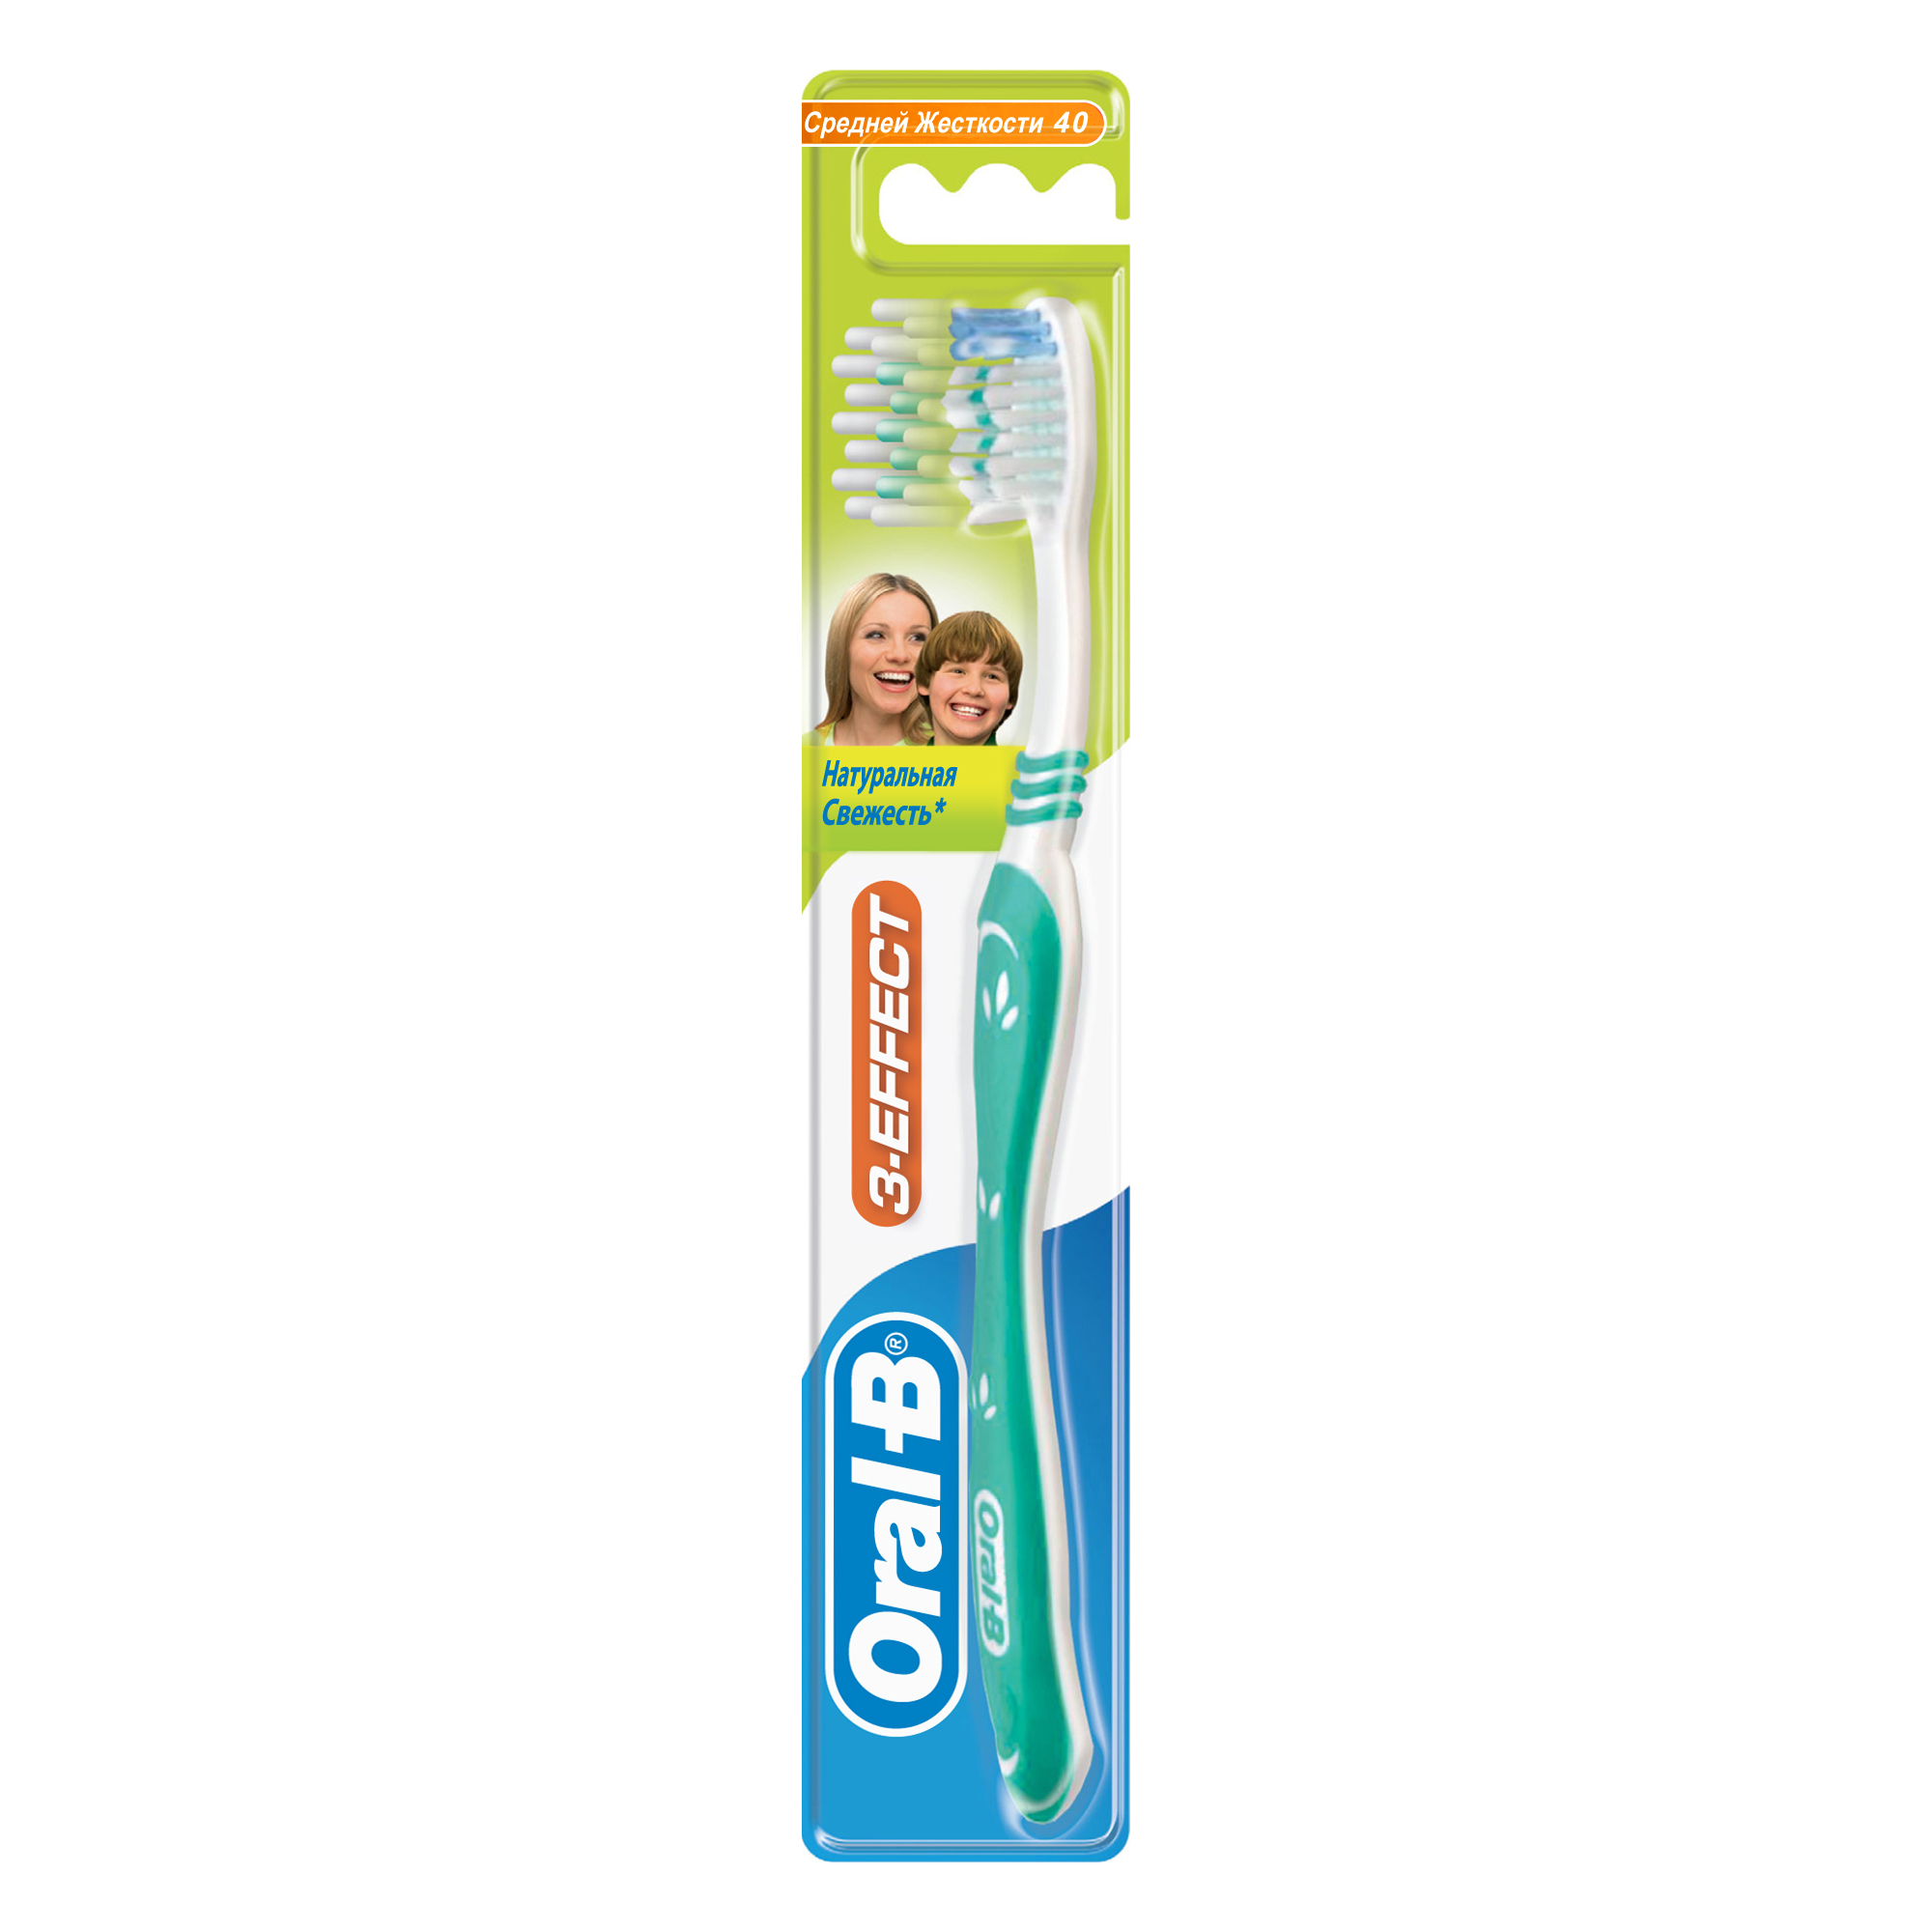 Зубная щетка Oral B 3_Effect Натуральная Свежесть